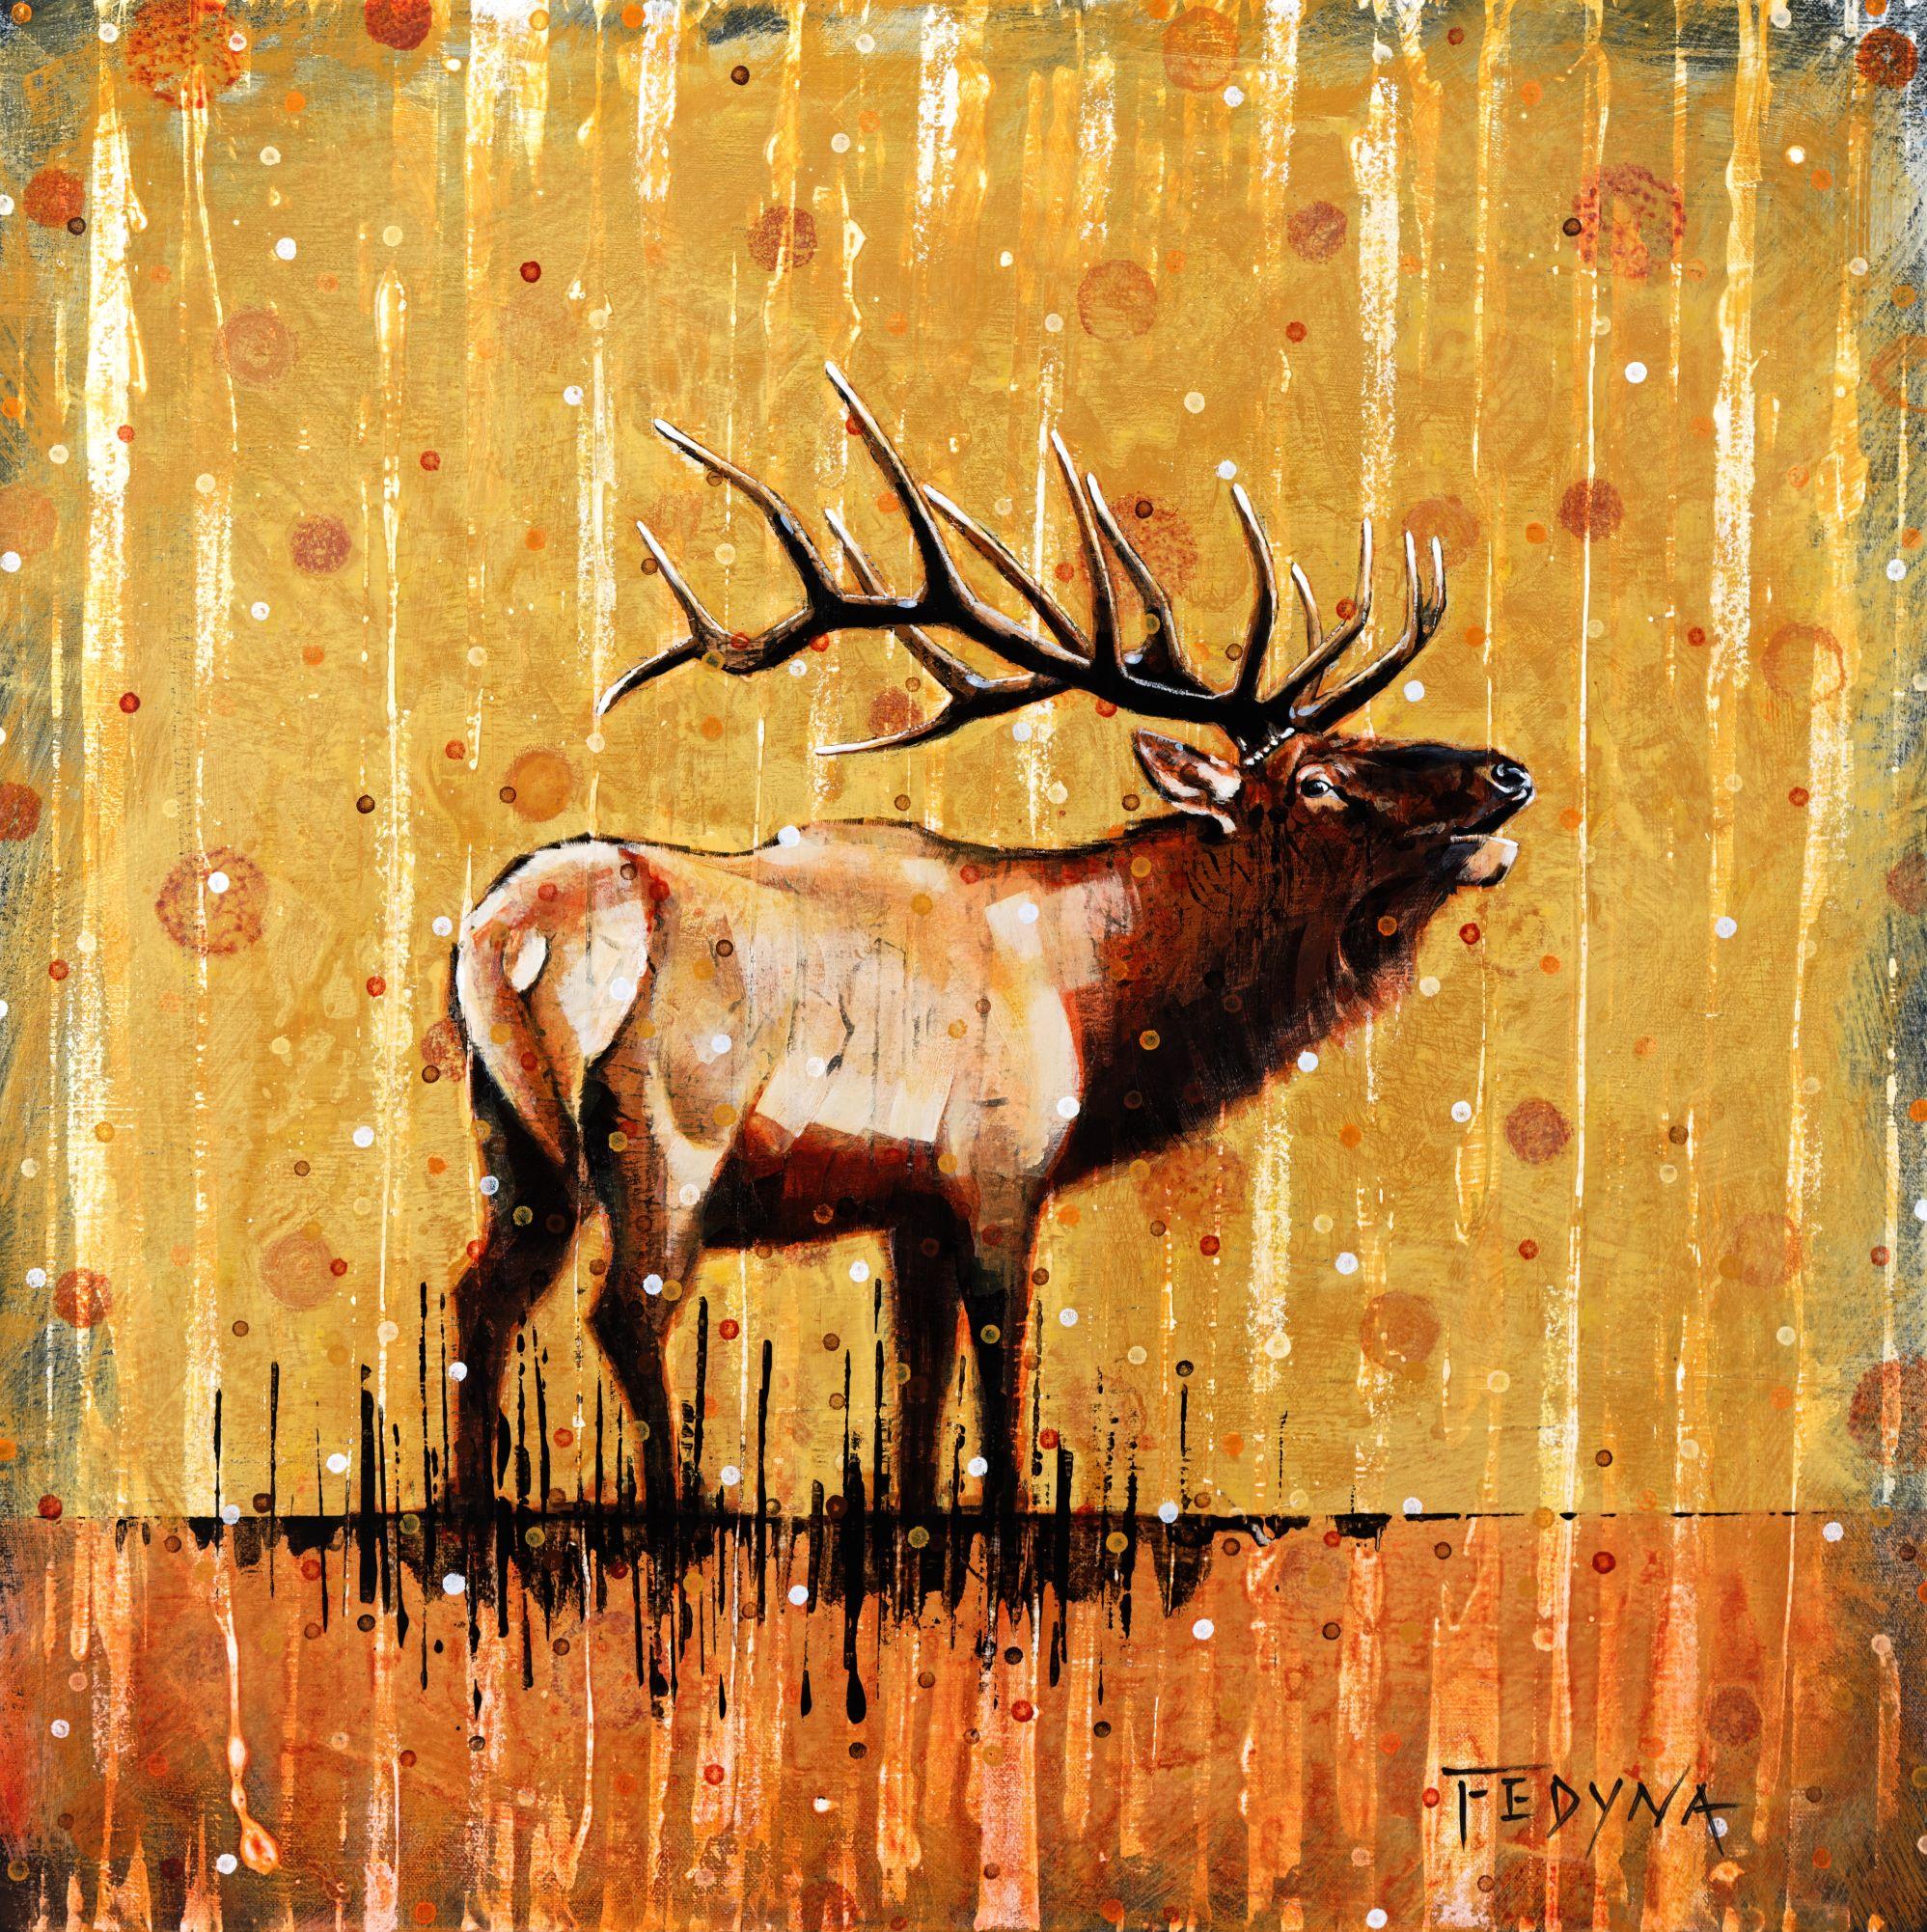 Fedyna.Painting. - Mighty Wapiti. resized.jpg